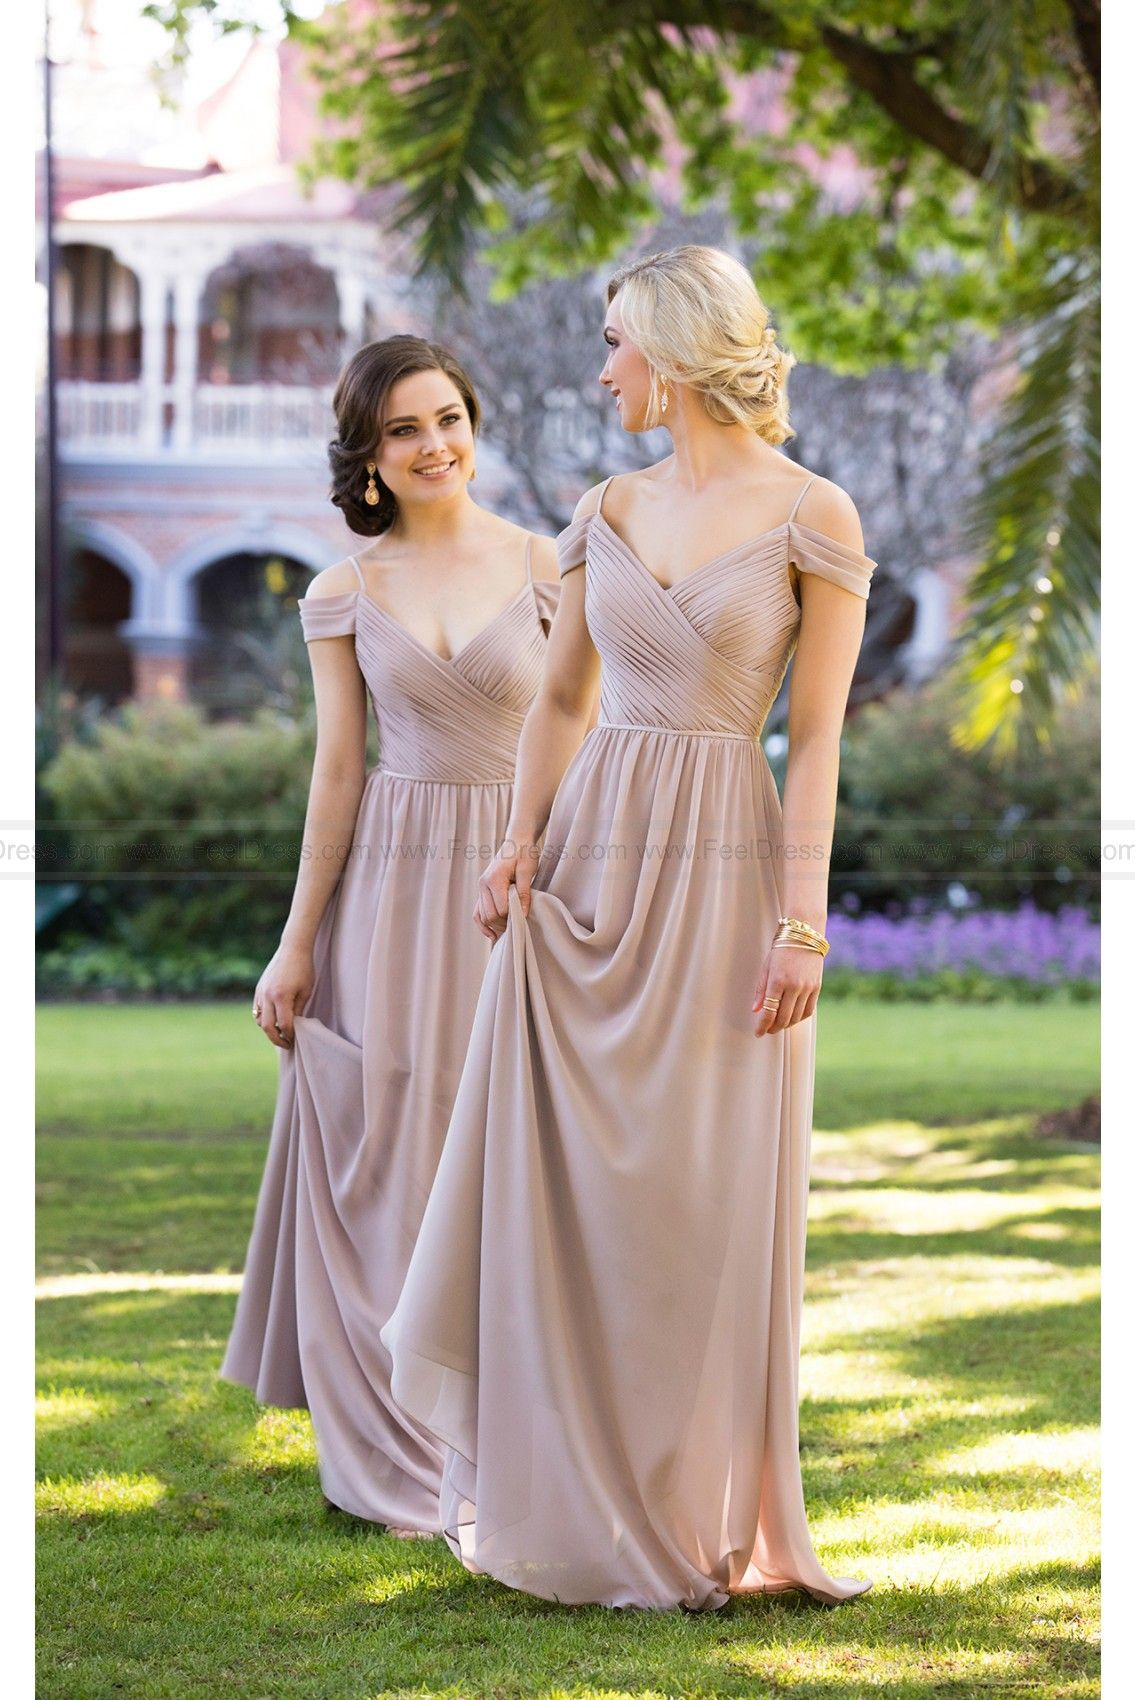 Sorella vita romantic off the shoulder bridesmaid dress style 8922 sorella vita romantic off the shoulder bridesmaid dress style 8922 ombrellifo Gallery